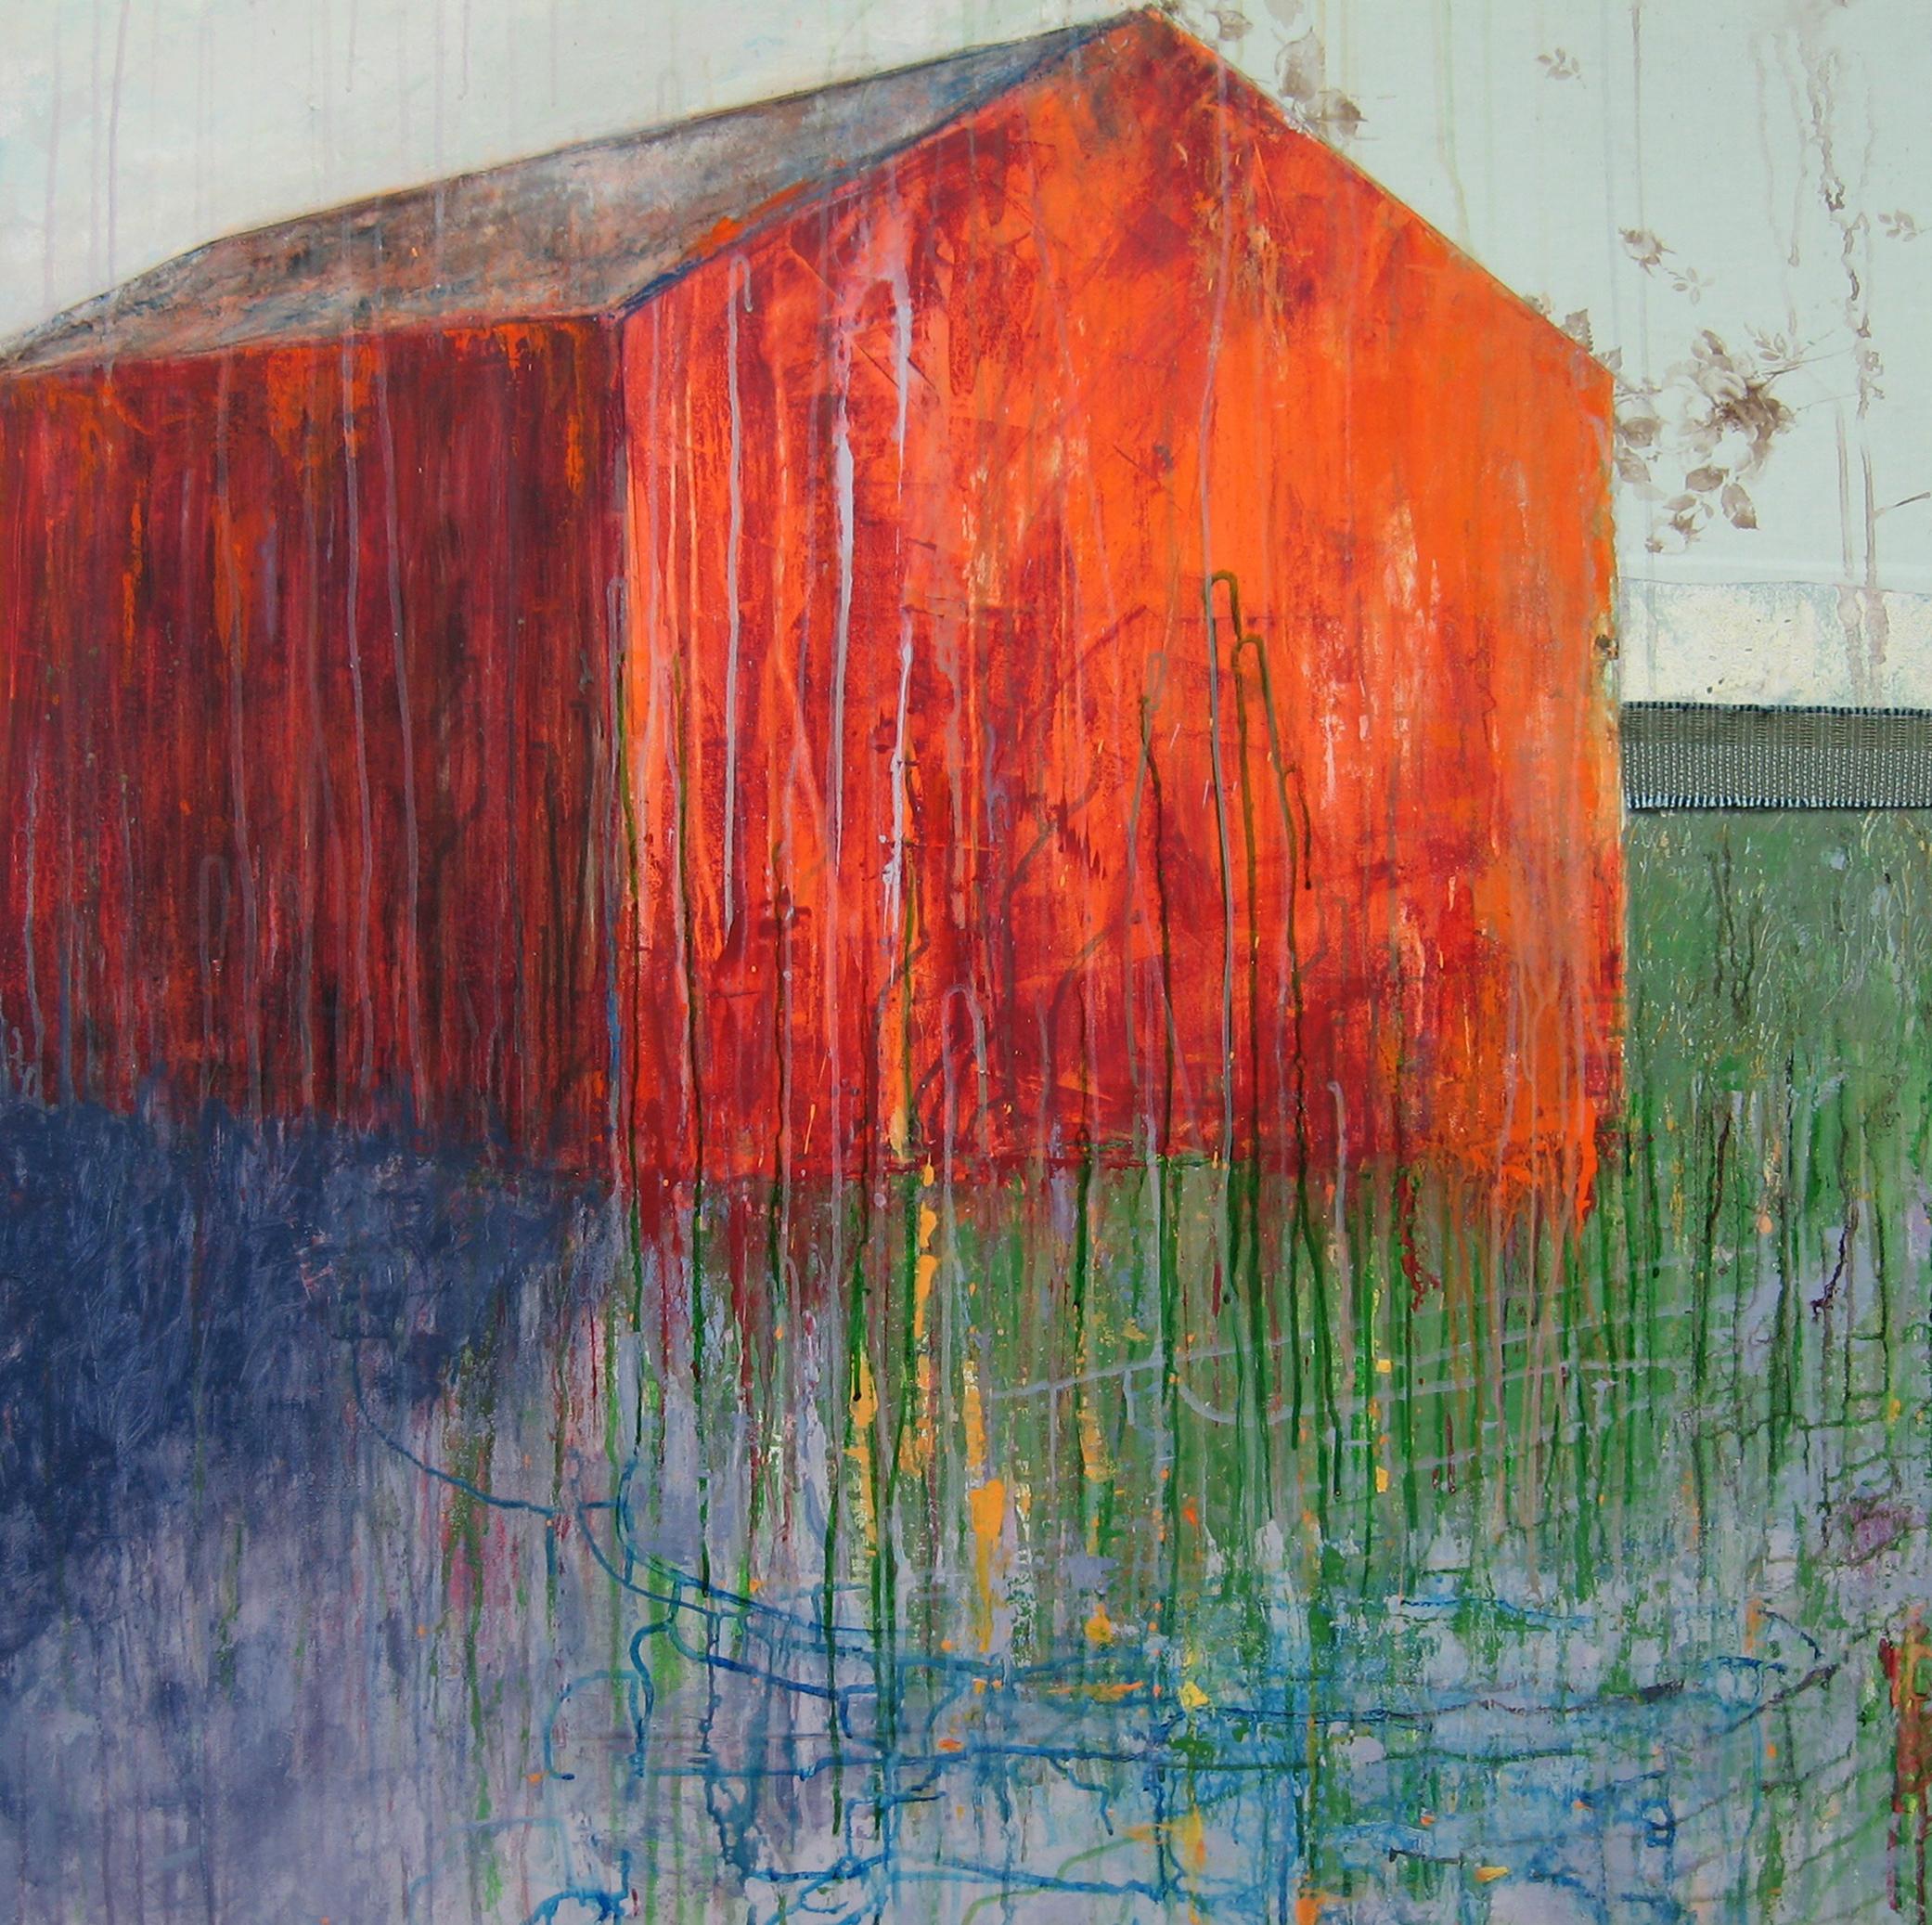 Brenda Cirioni,  Barn Series: Glow II, Mixed media painting, 40x40